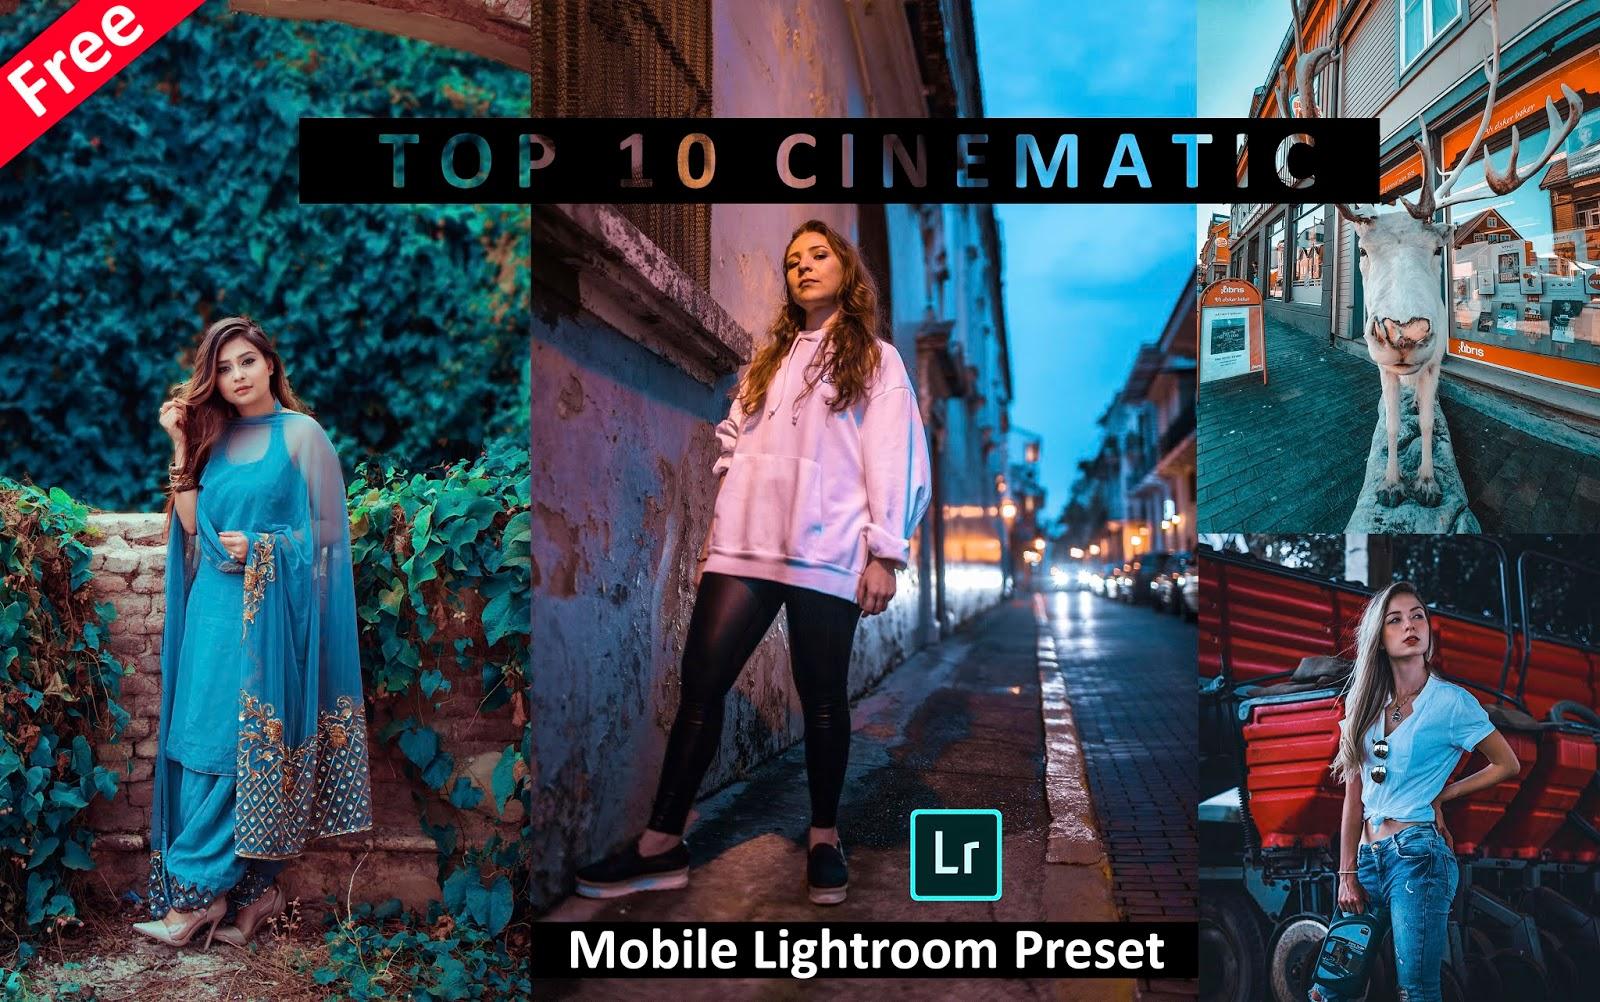 Download Top 10 CINEMATIC Mobile Lightroom Presets for Free | Cinematic Effect in Mobile Lightroom